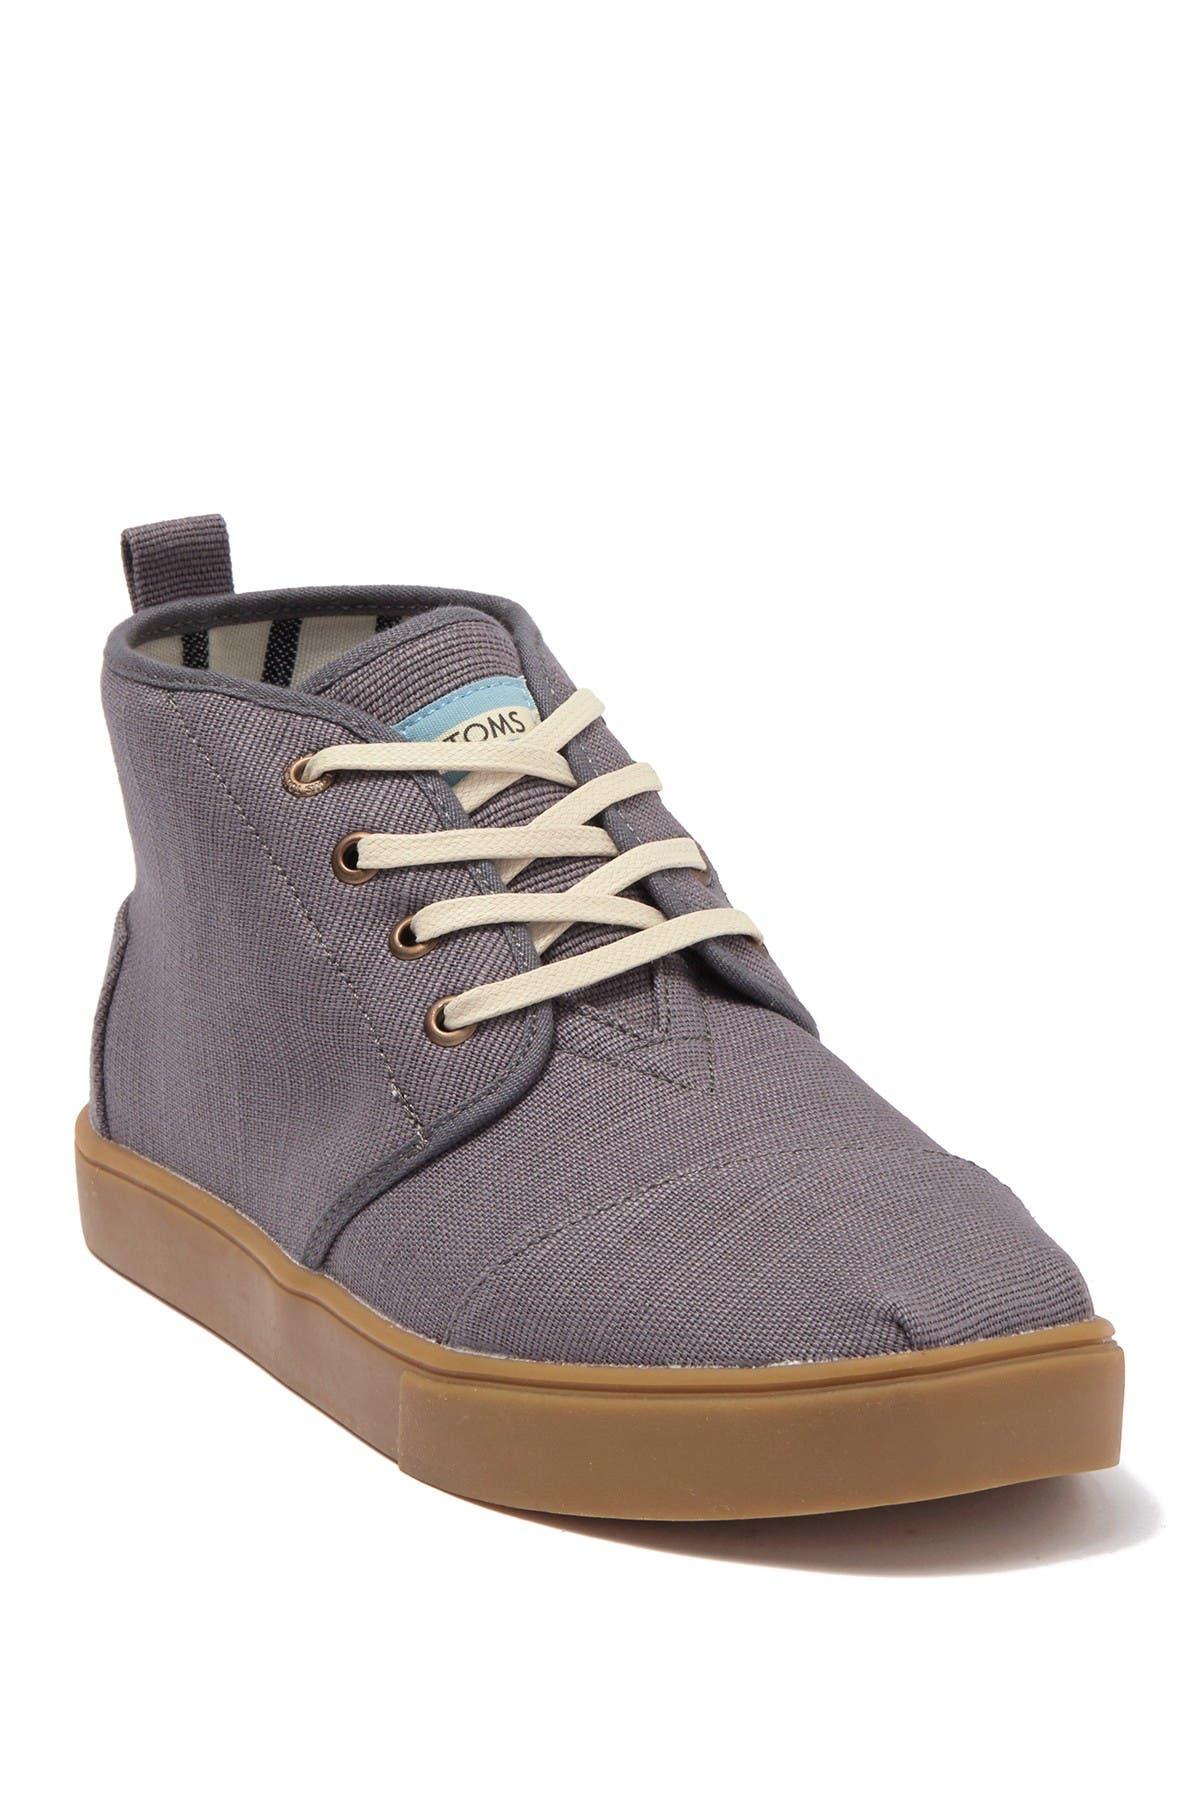 Image of TOMS Bota Sneaker